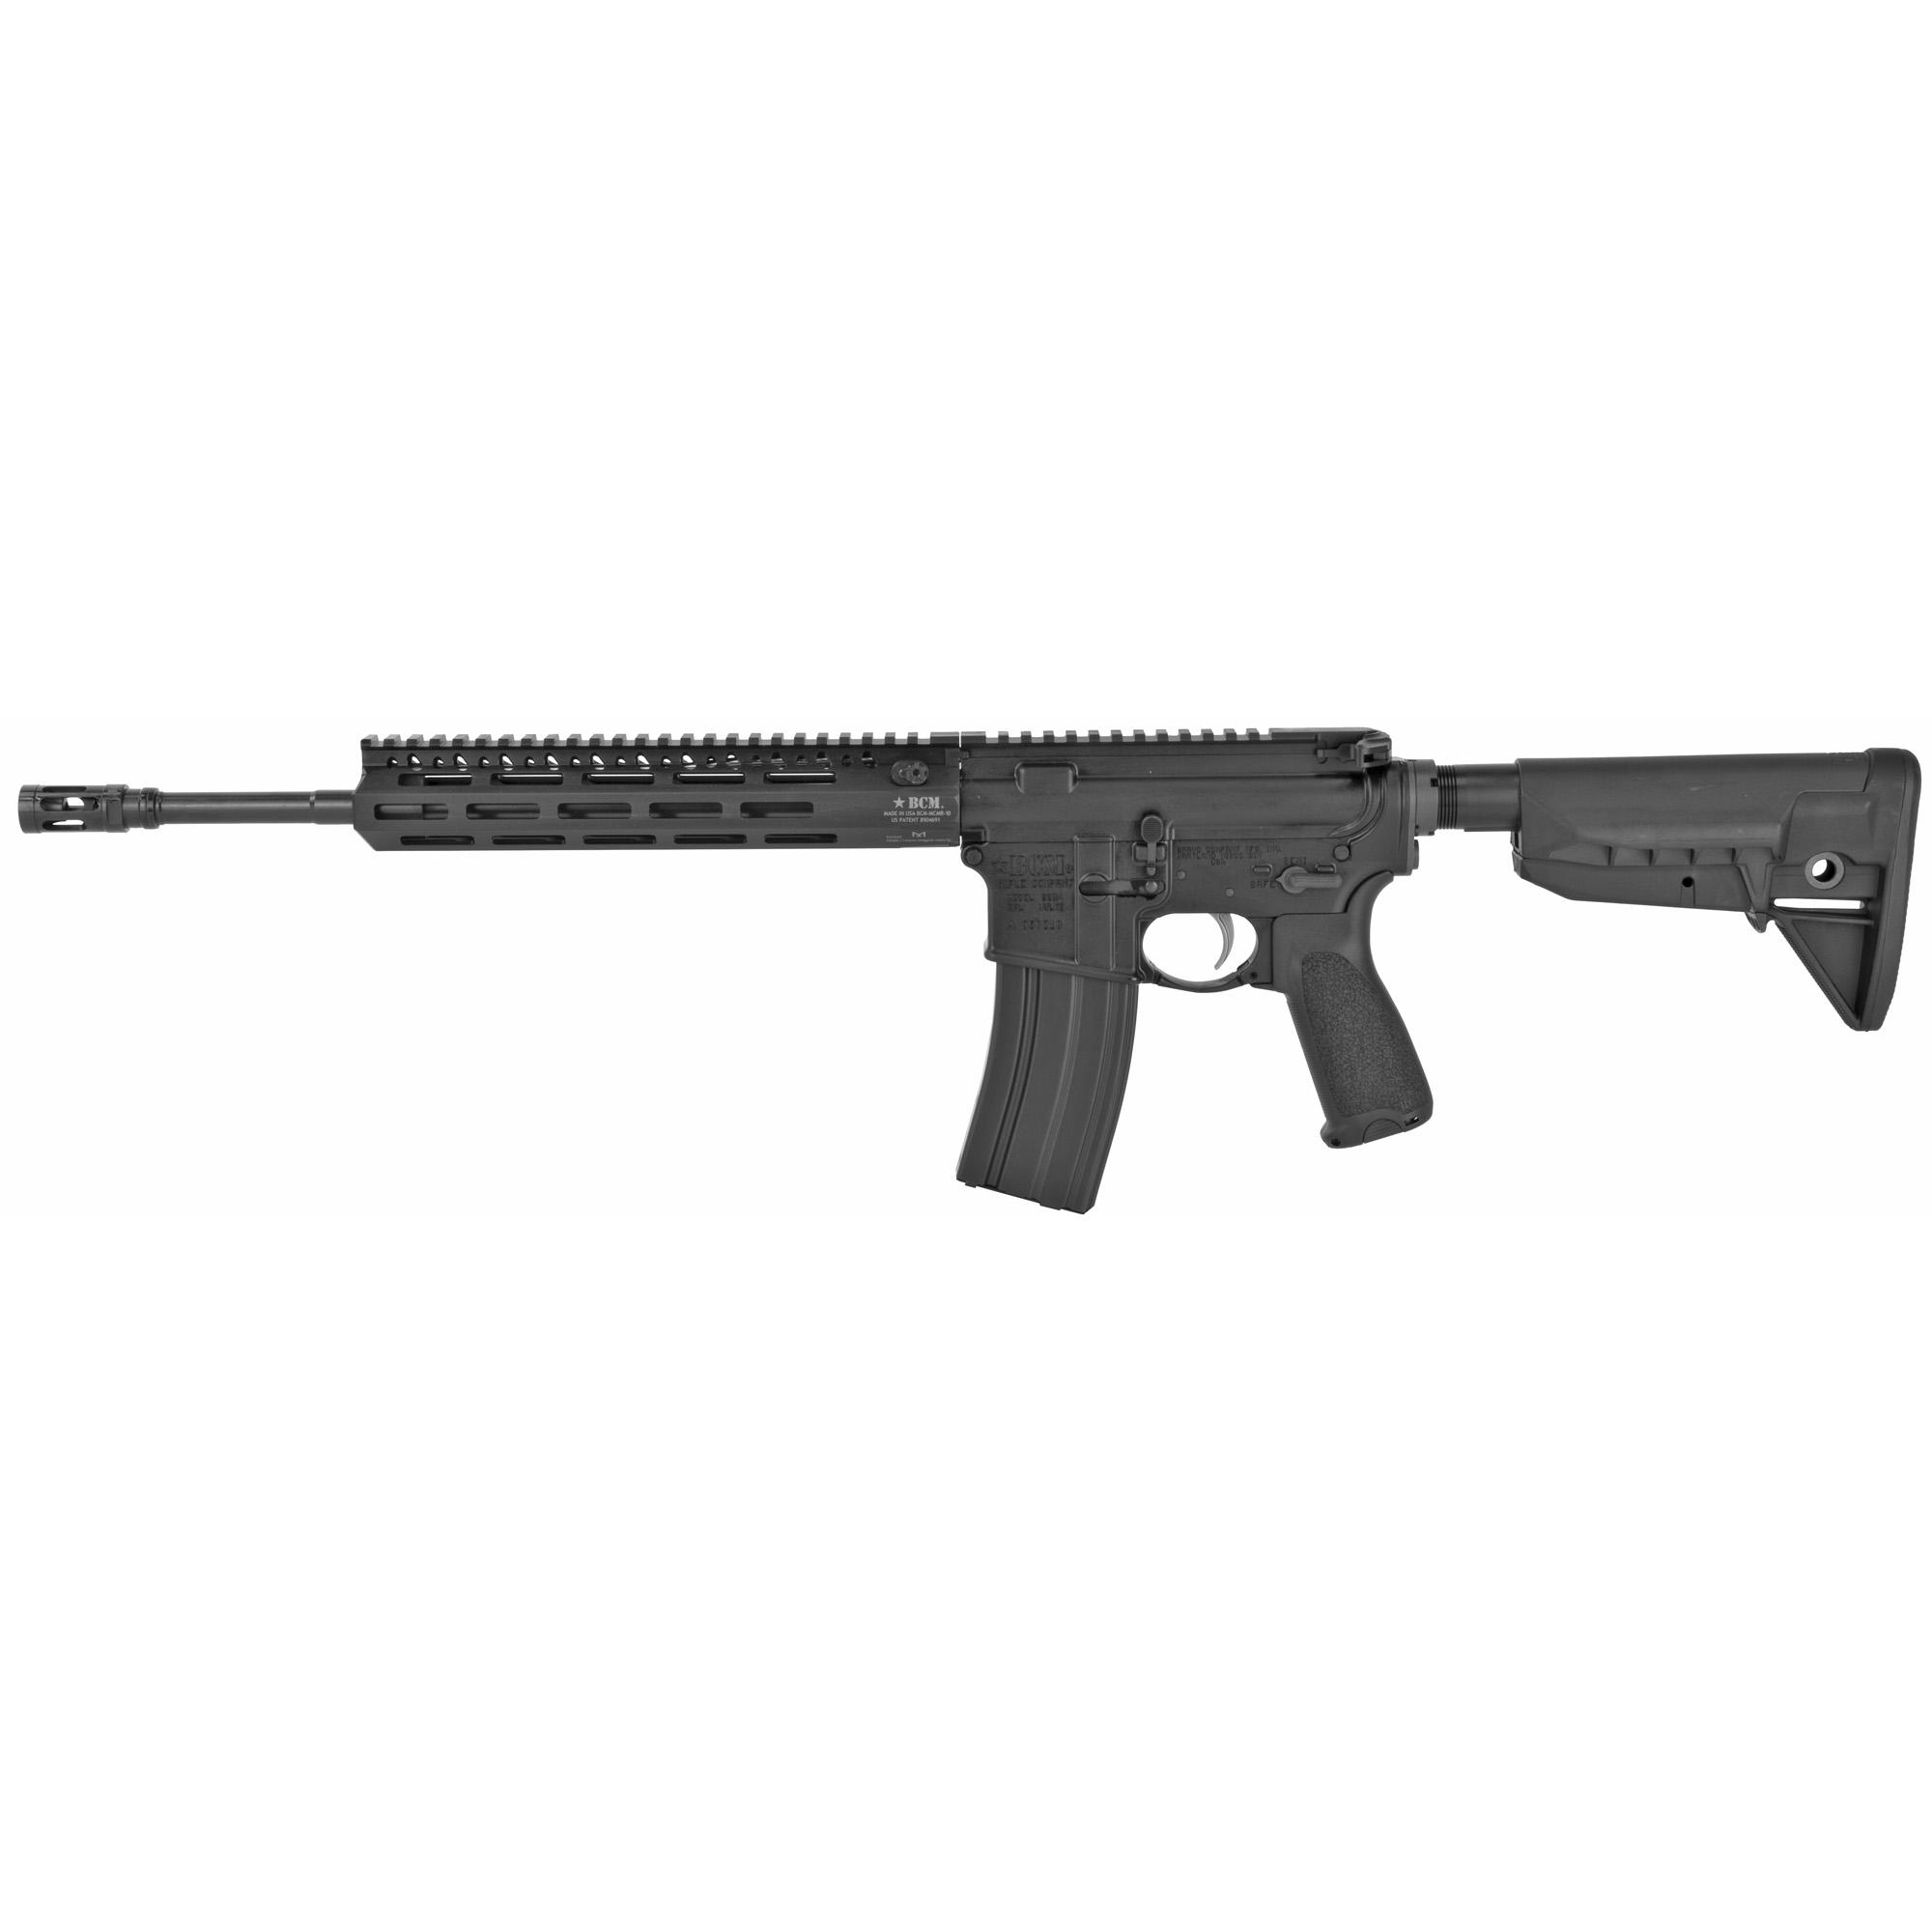 Bravo Company Reece-14 Mcmr-Lw Carbine 14.5″ Pinned (16″ Oal) 5.56 NATO 30Rd – Black